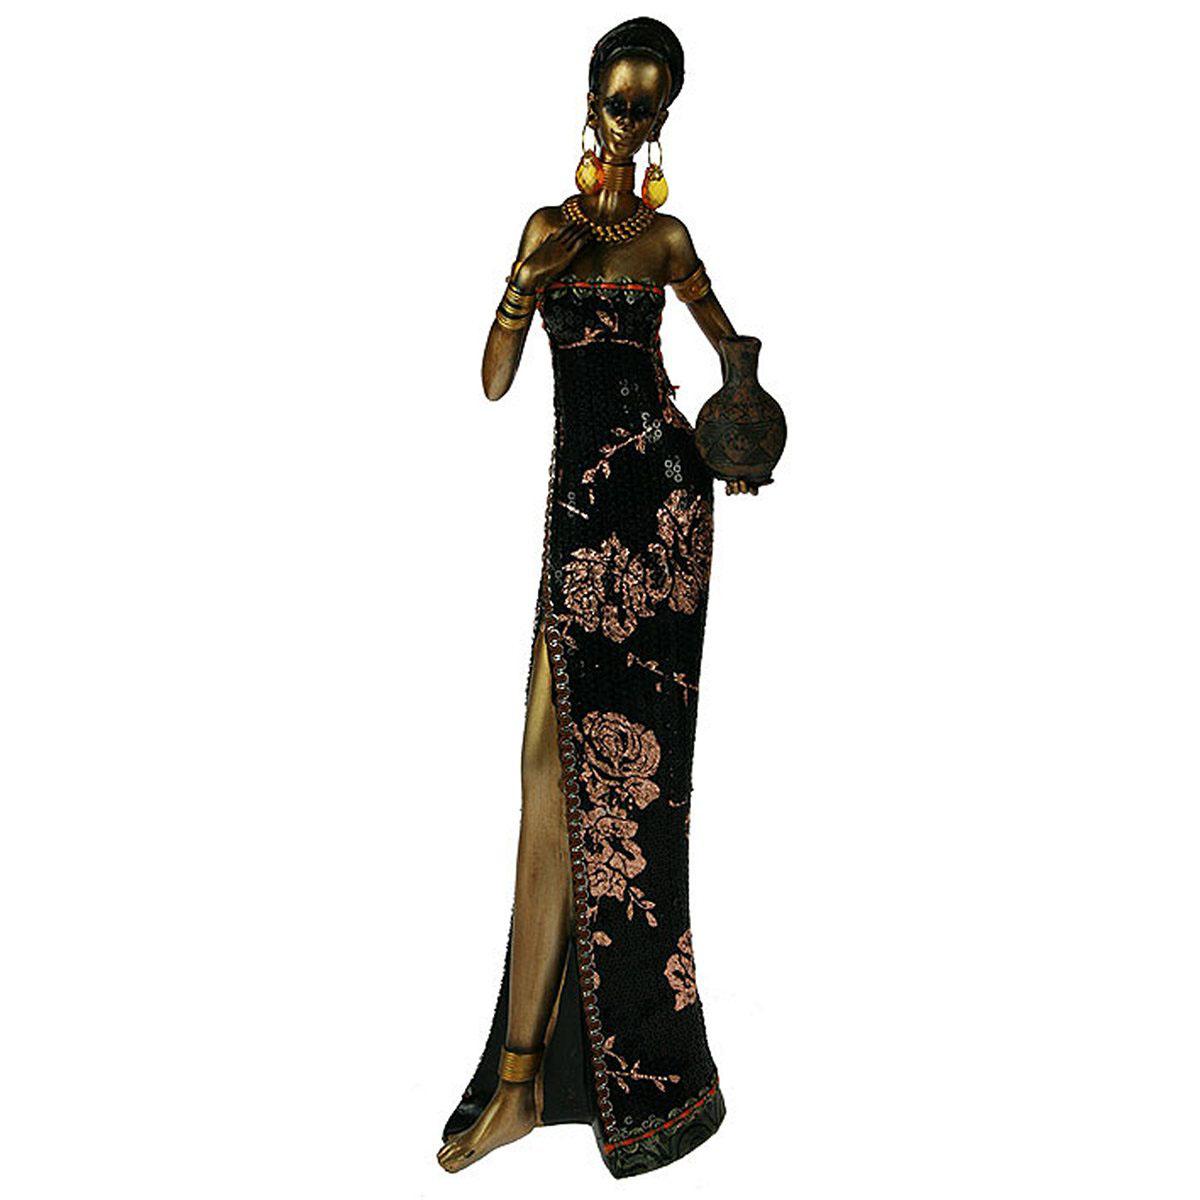 Статуэтка Русские Подарки Африканка, 14 х 8 х 43 см. 26126 статуэтка русские подарки африканка 11 х 15 х 24 см